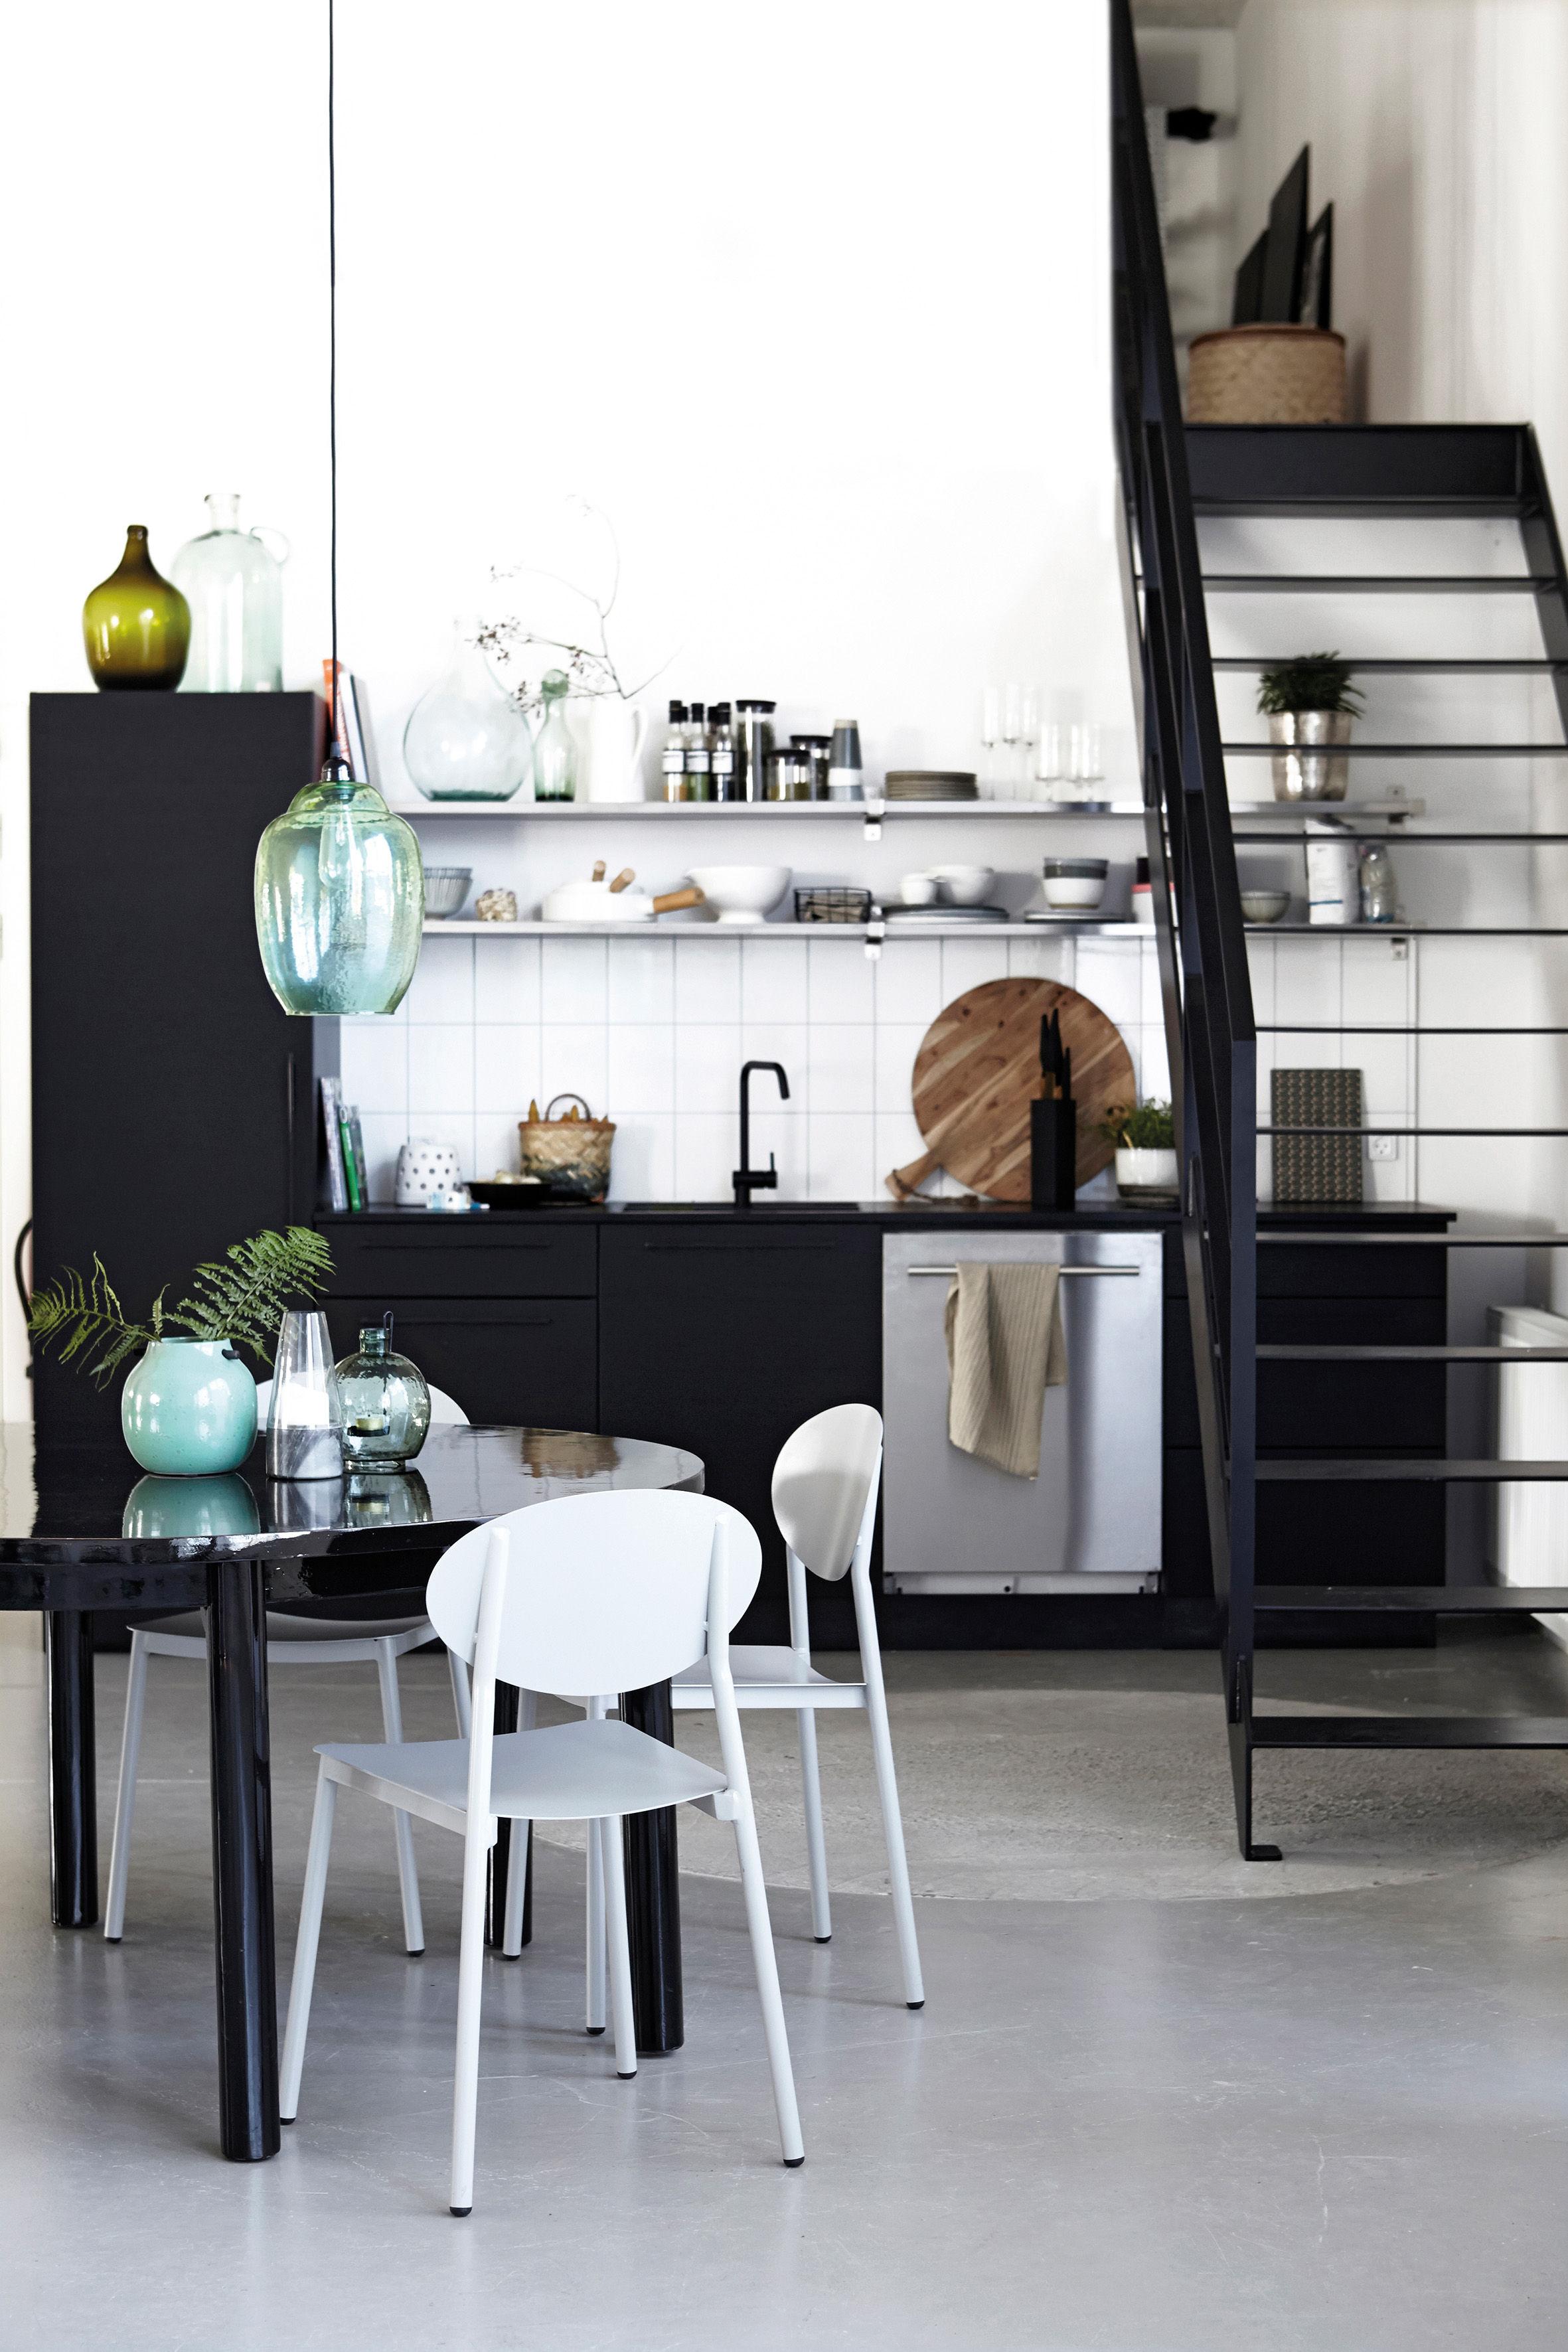 walker stuhl metall f r innen und au en grau by house doctor made in design. Black Bedroom Furniture Sets. Home Design Ideas